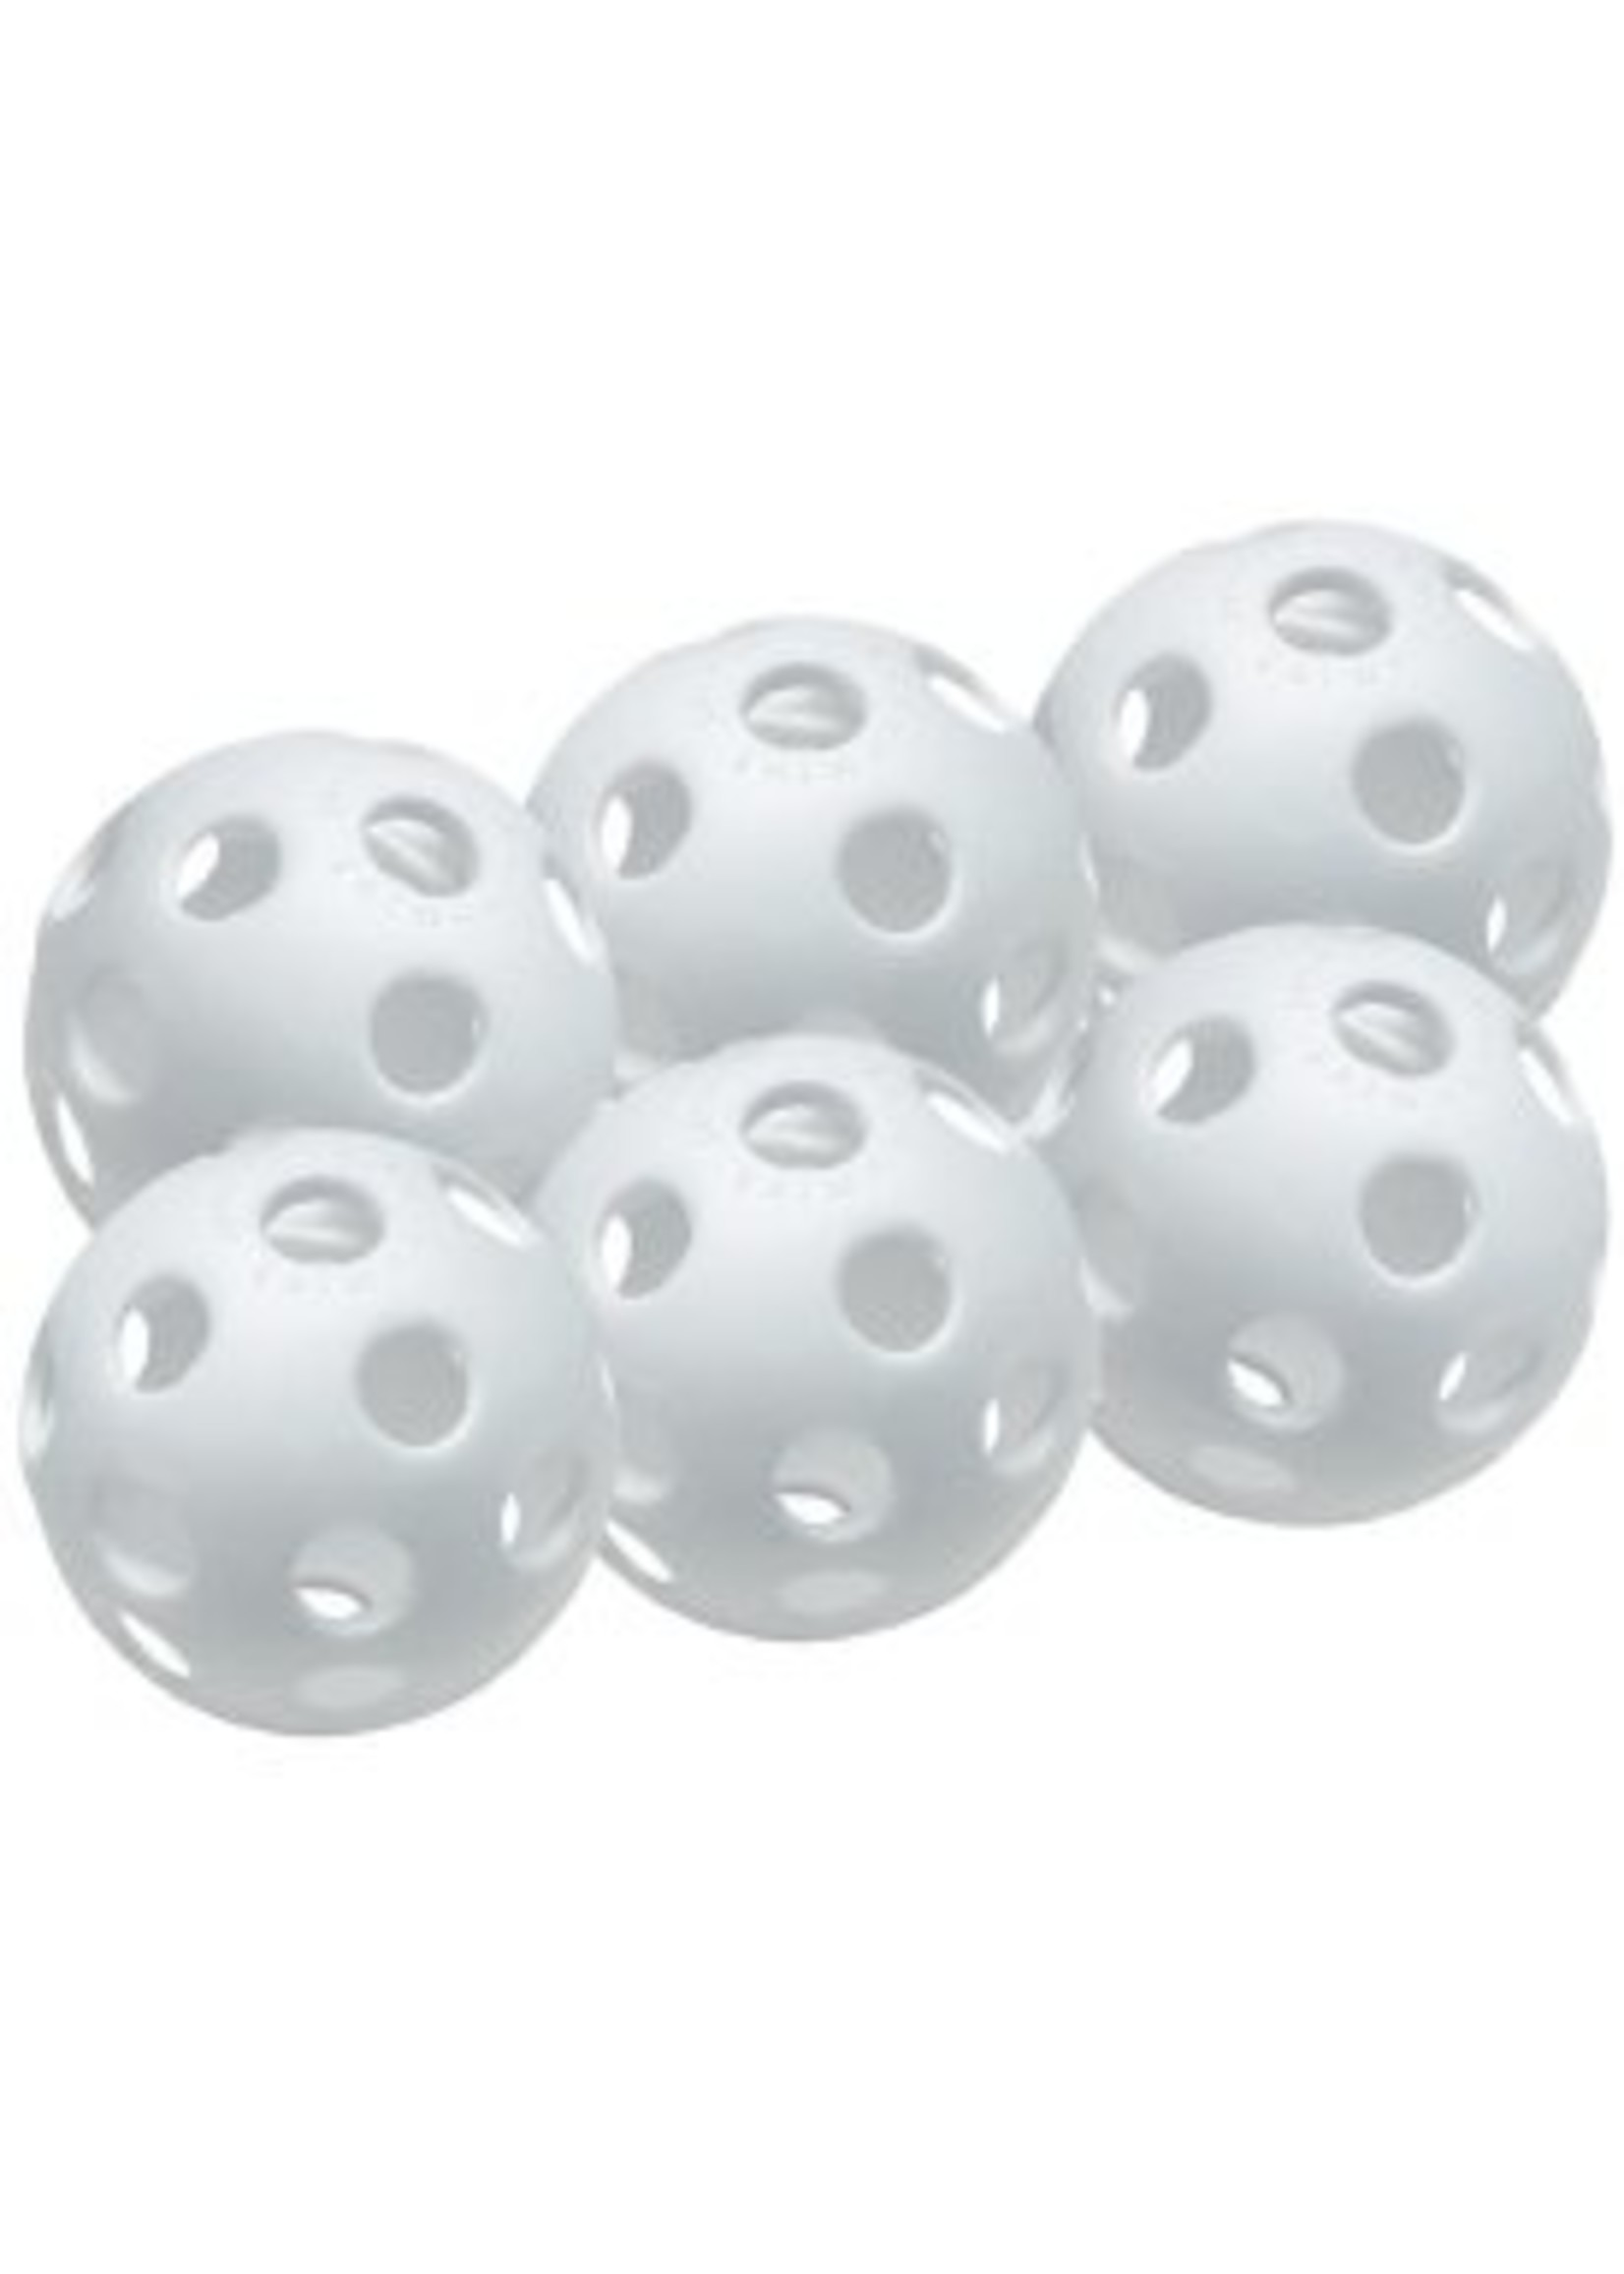 "Easton Baseball (Canada) EASTON 9"" WHITE PLASTIC TRAINING BASEBALLS   6PK PRICE   6 CASE PACKS QTYS"